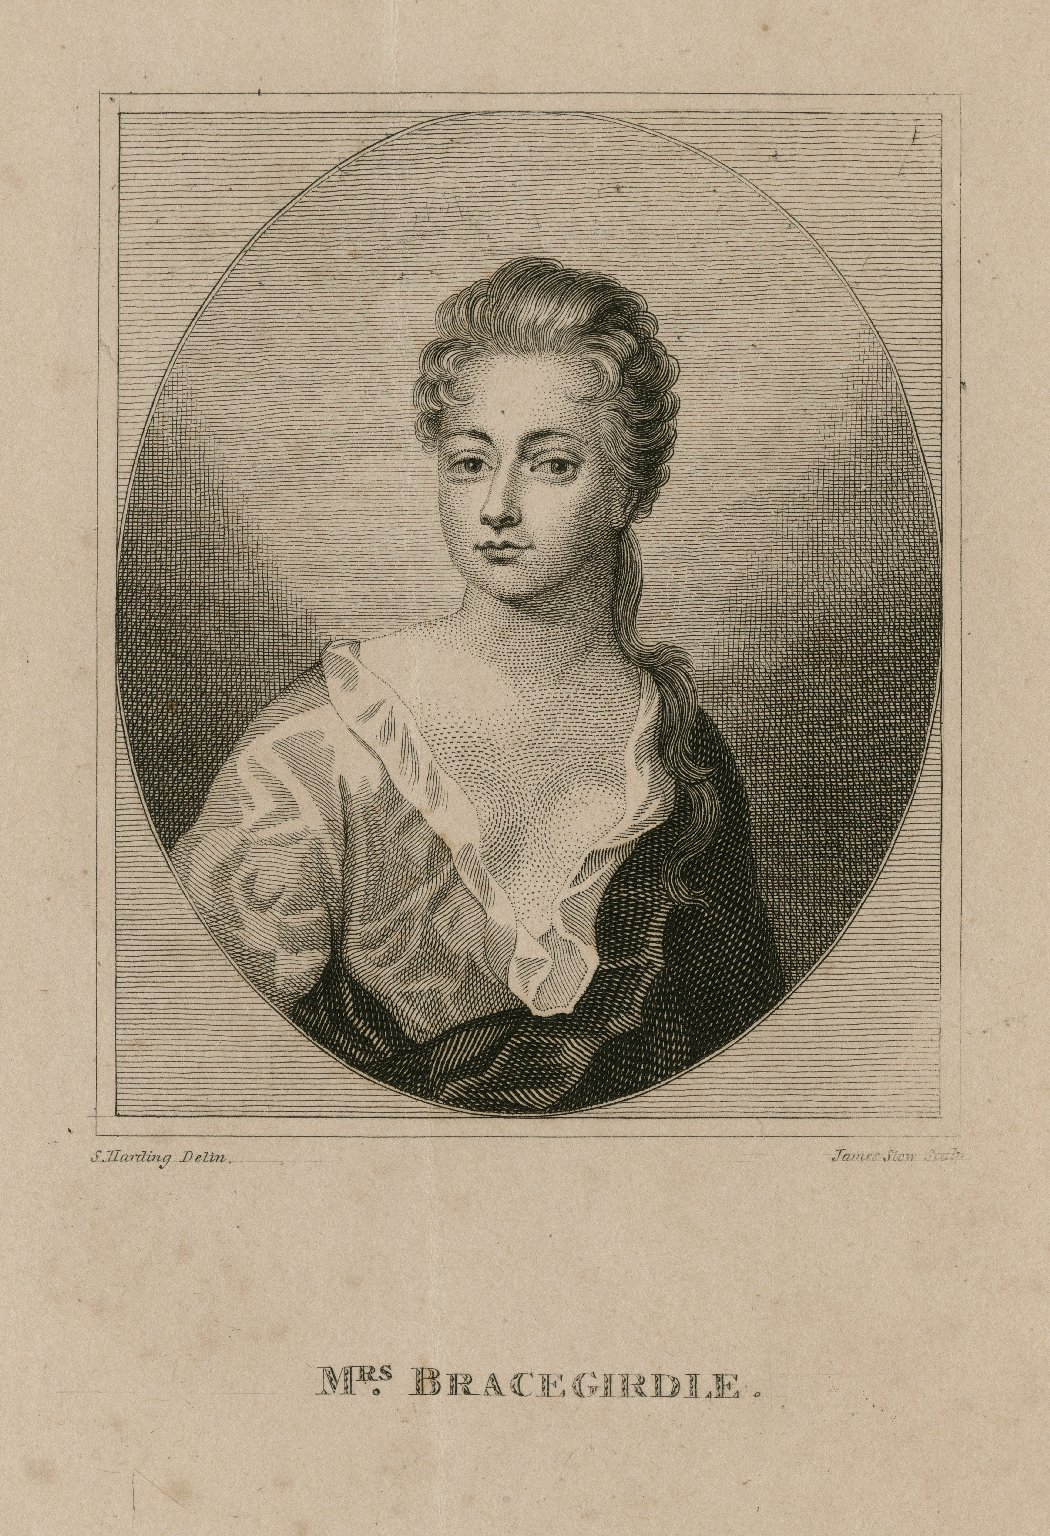 Mrs. Bracegirdle [graphic] / S. Harding, delin. ; James Stow, sculp.